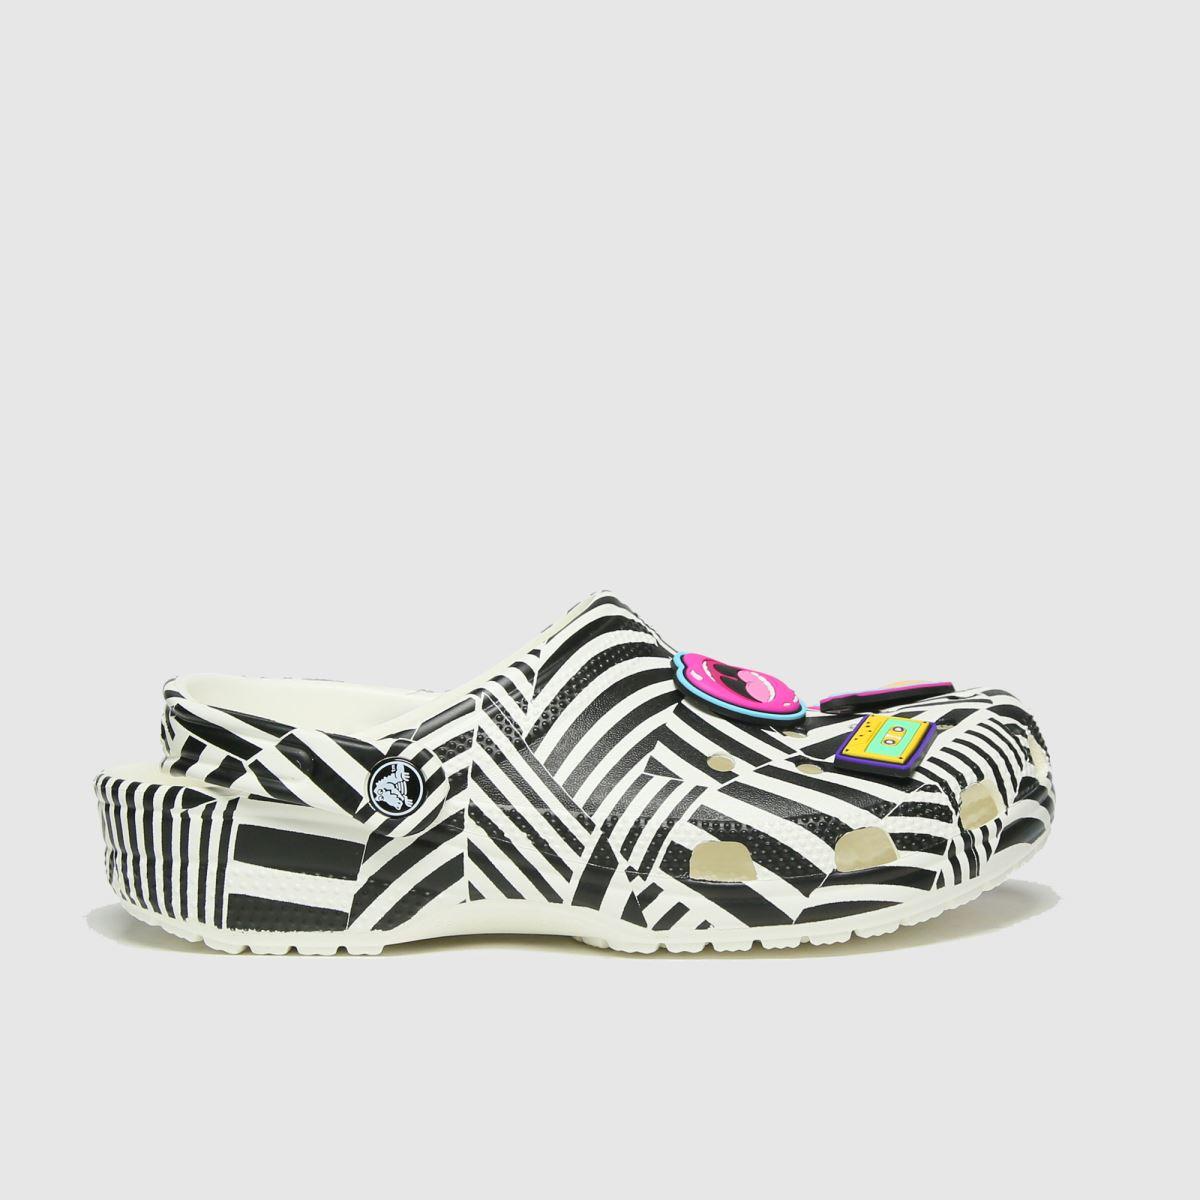 Crocs White & Black 90s Rock Classic Clog Sandals